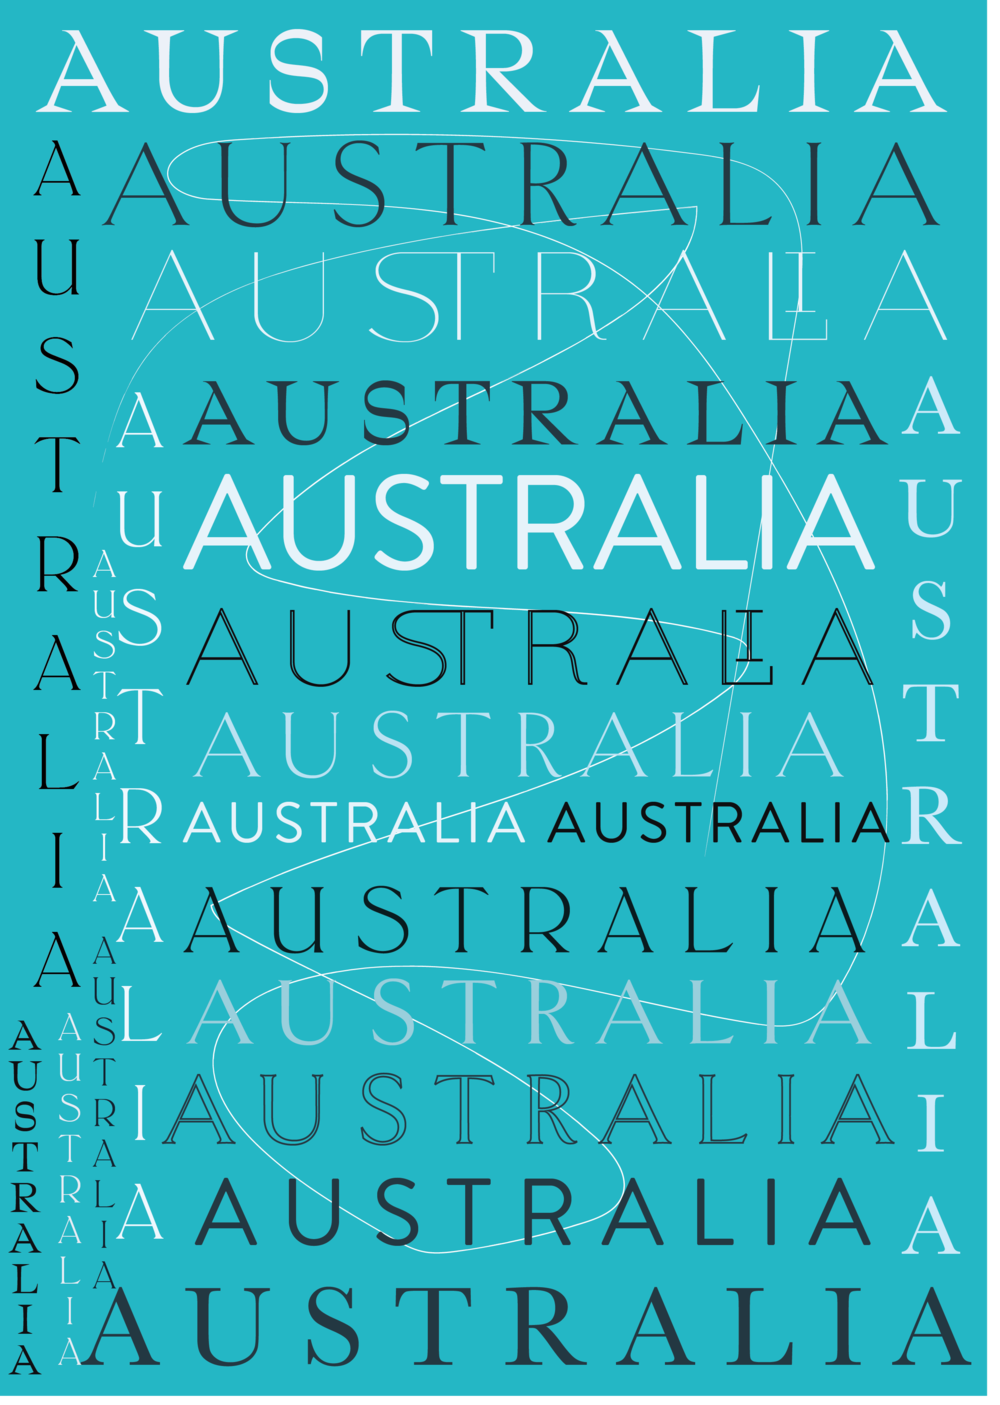 Australia Typography Poster // Phylleli Design Studio and Blog